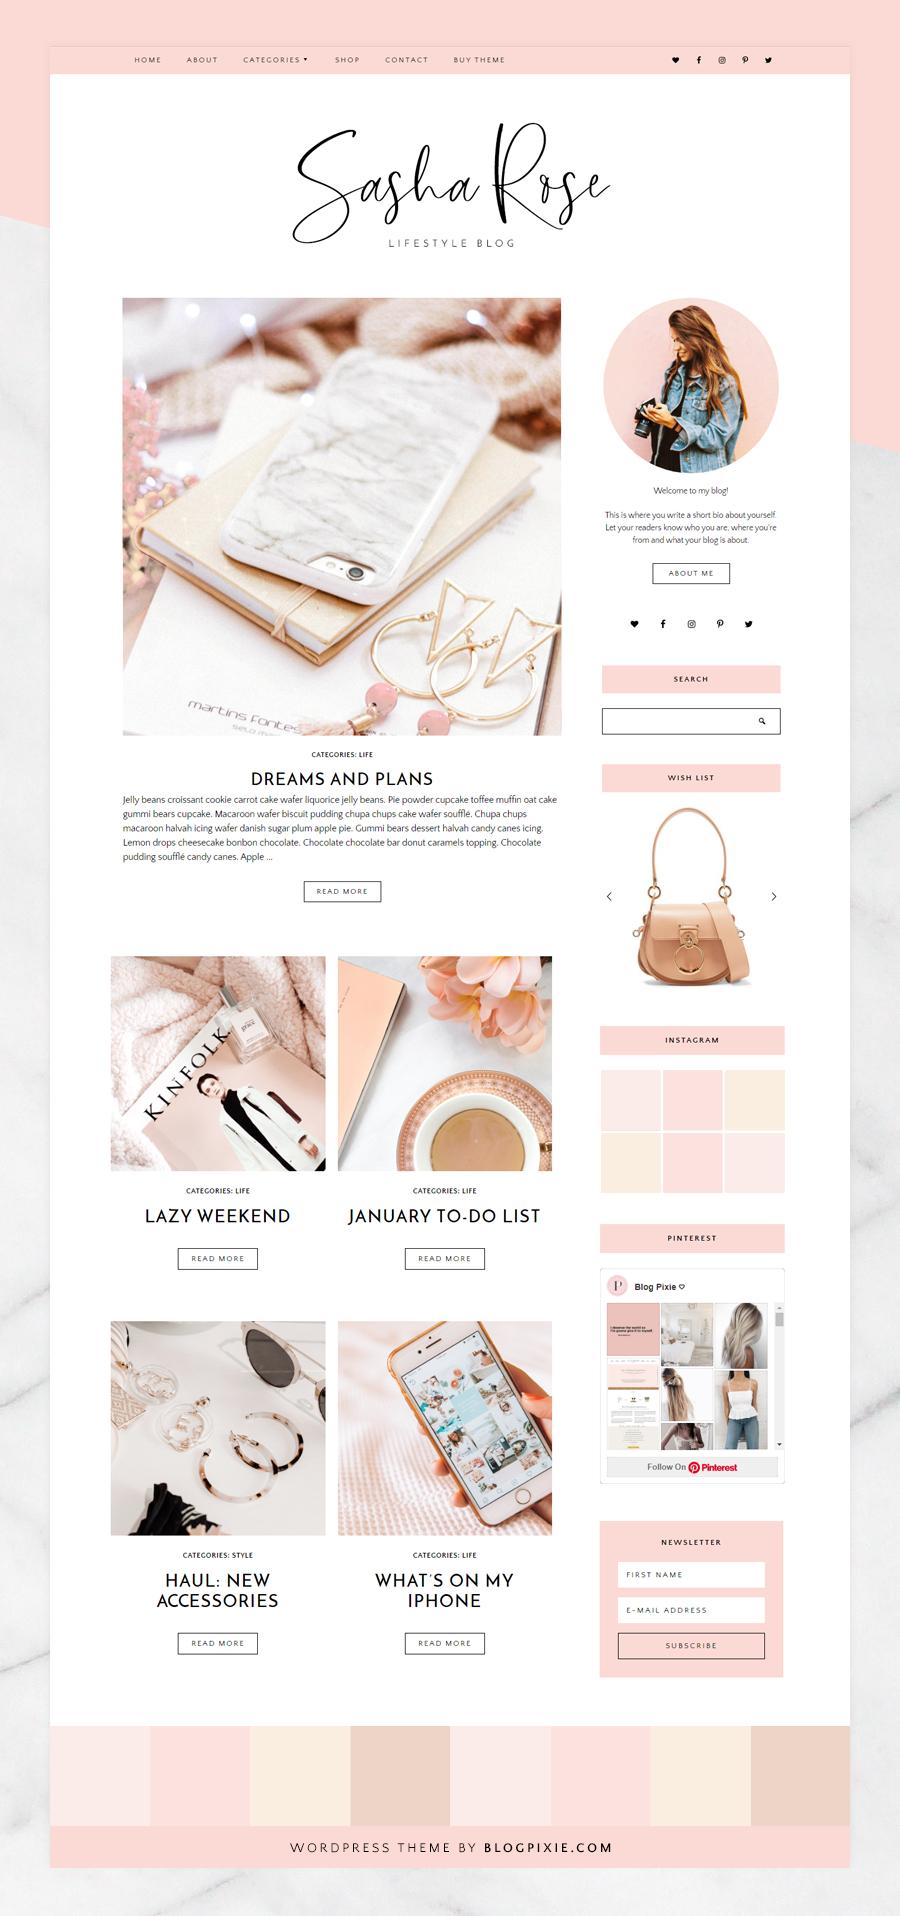 Wordpress Themes For Bloggers - Sasha Rose Wordpress Blog Theme by Blog Pixie